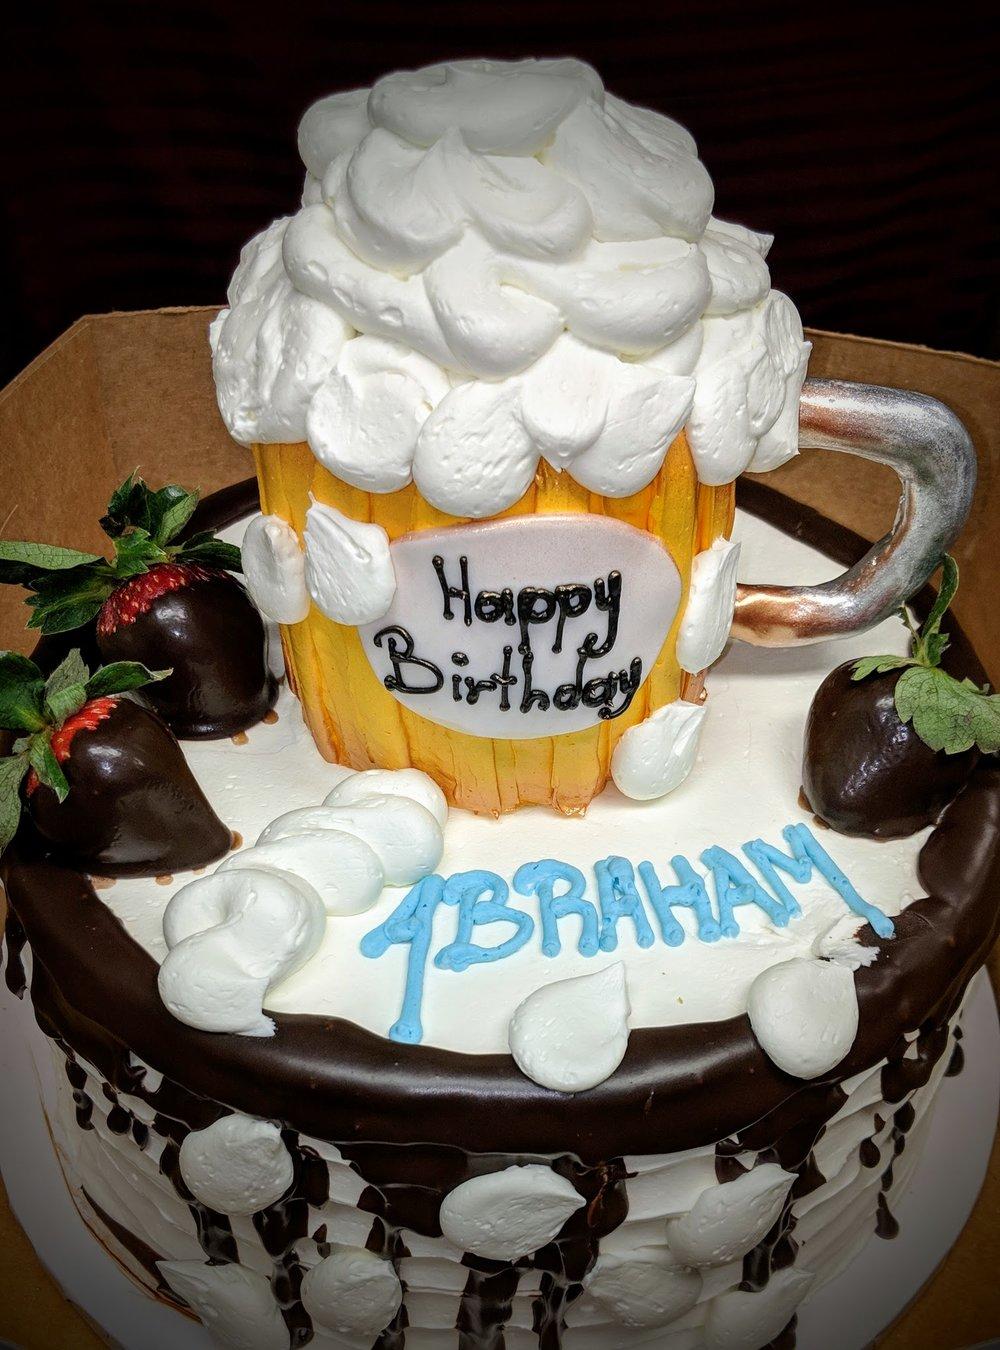 Bottom Up Abraham!